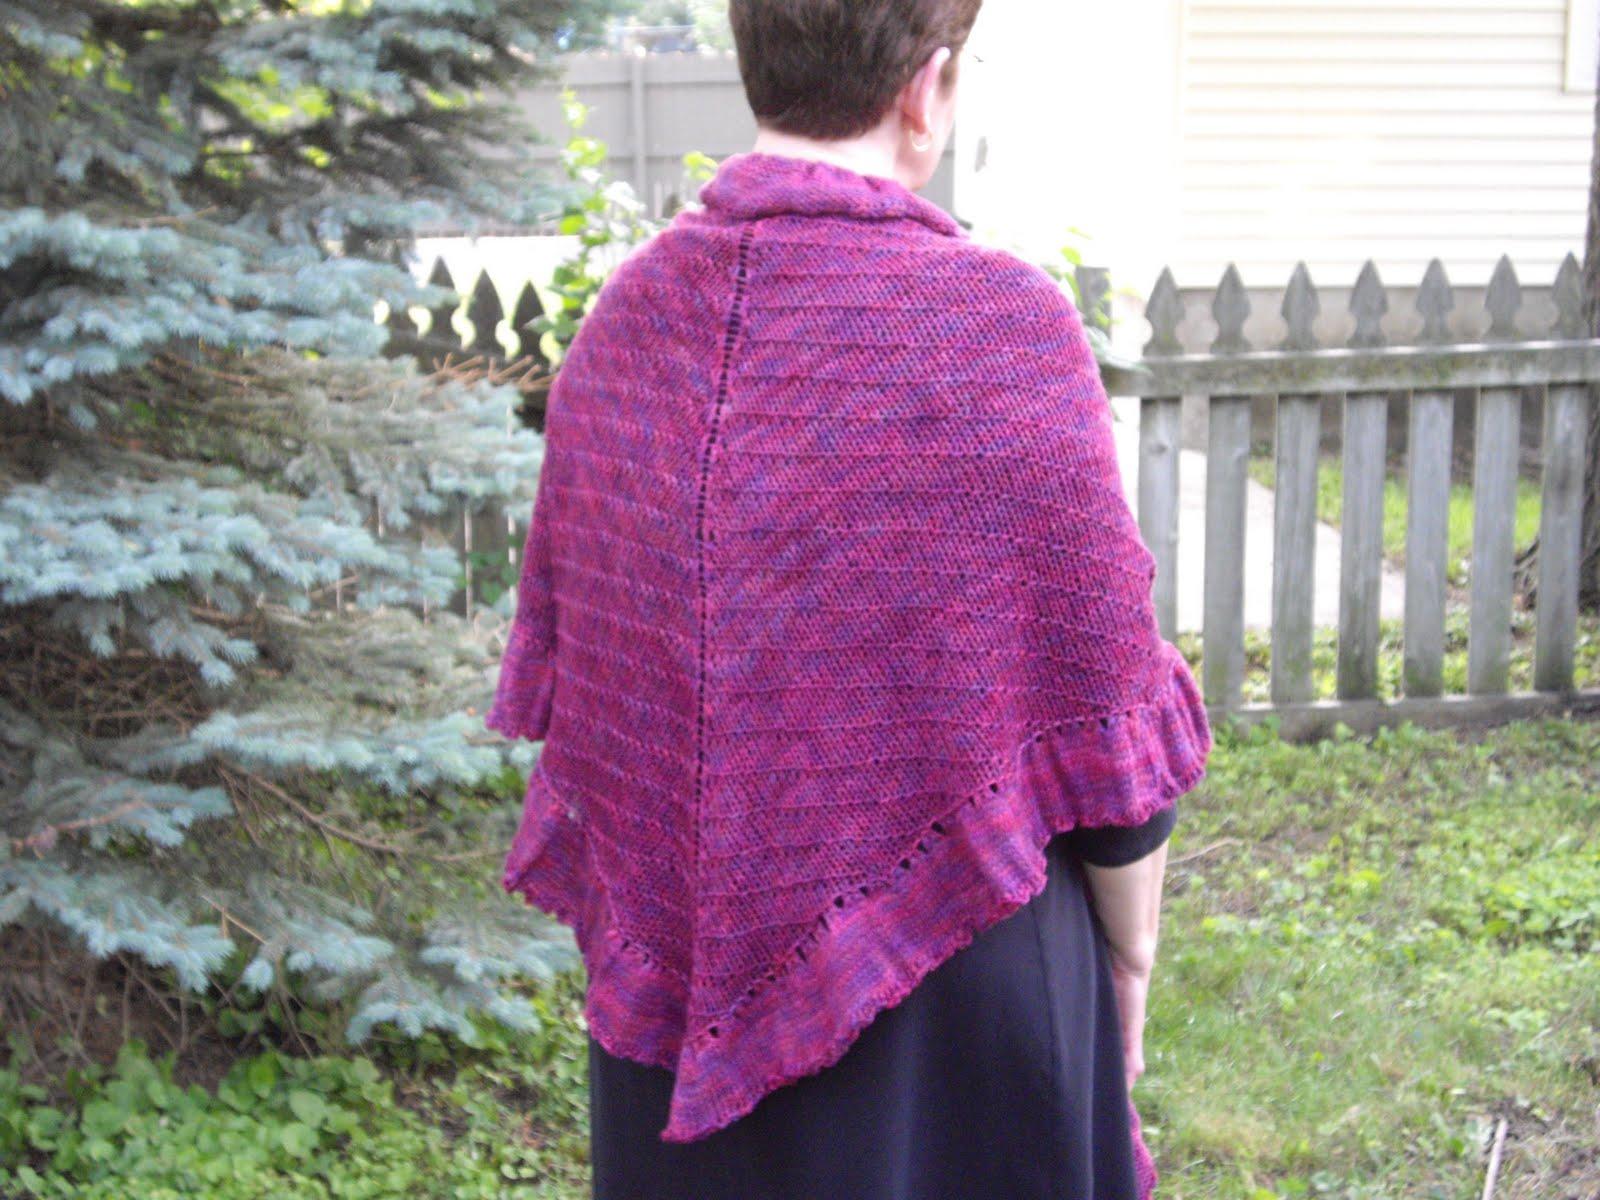 Knitting Pattern For Kate Middleton s Shawl : Knitting Professor: May Adventures in Knitting